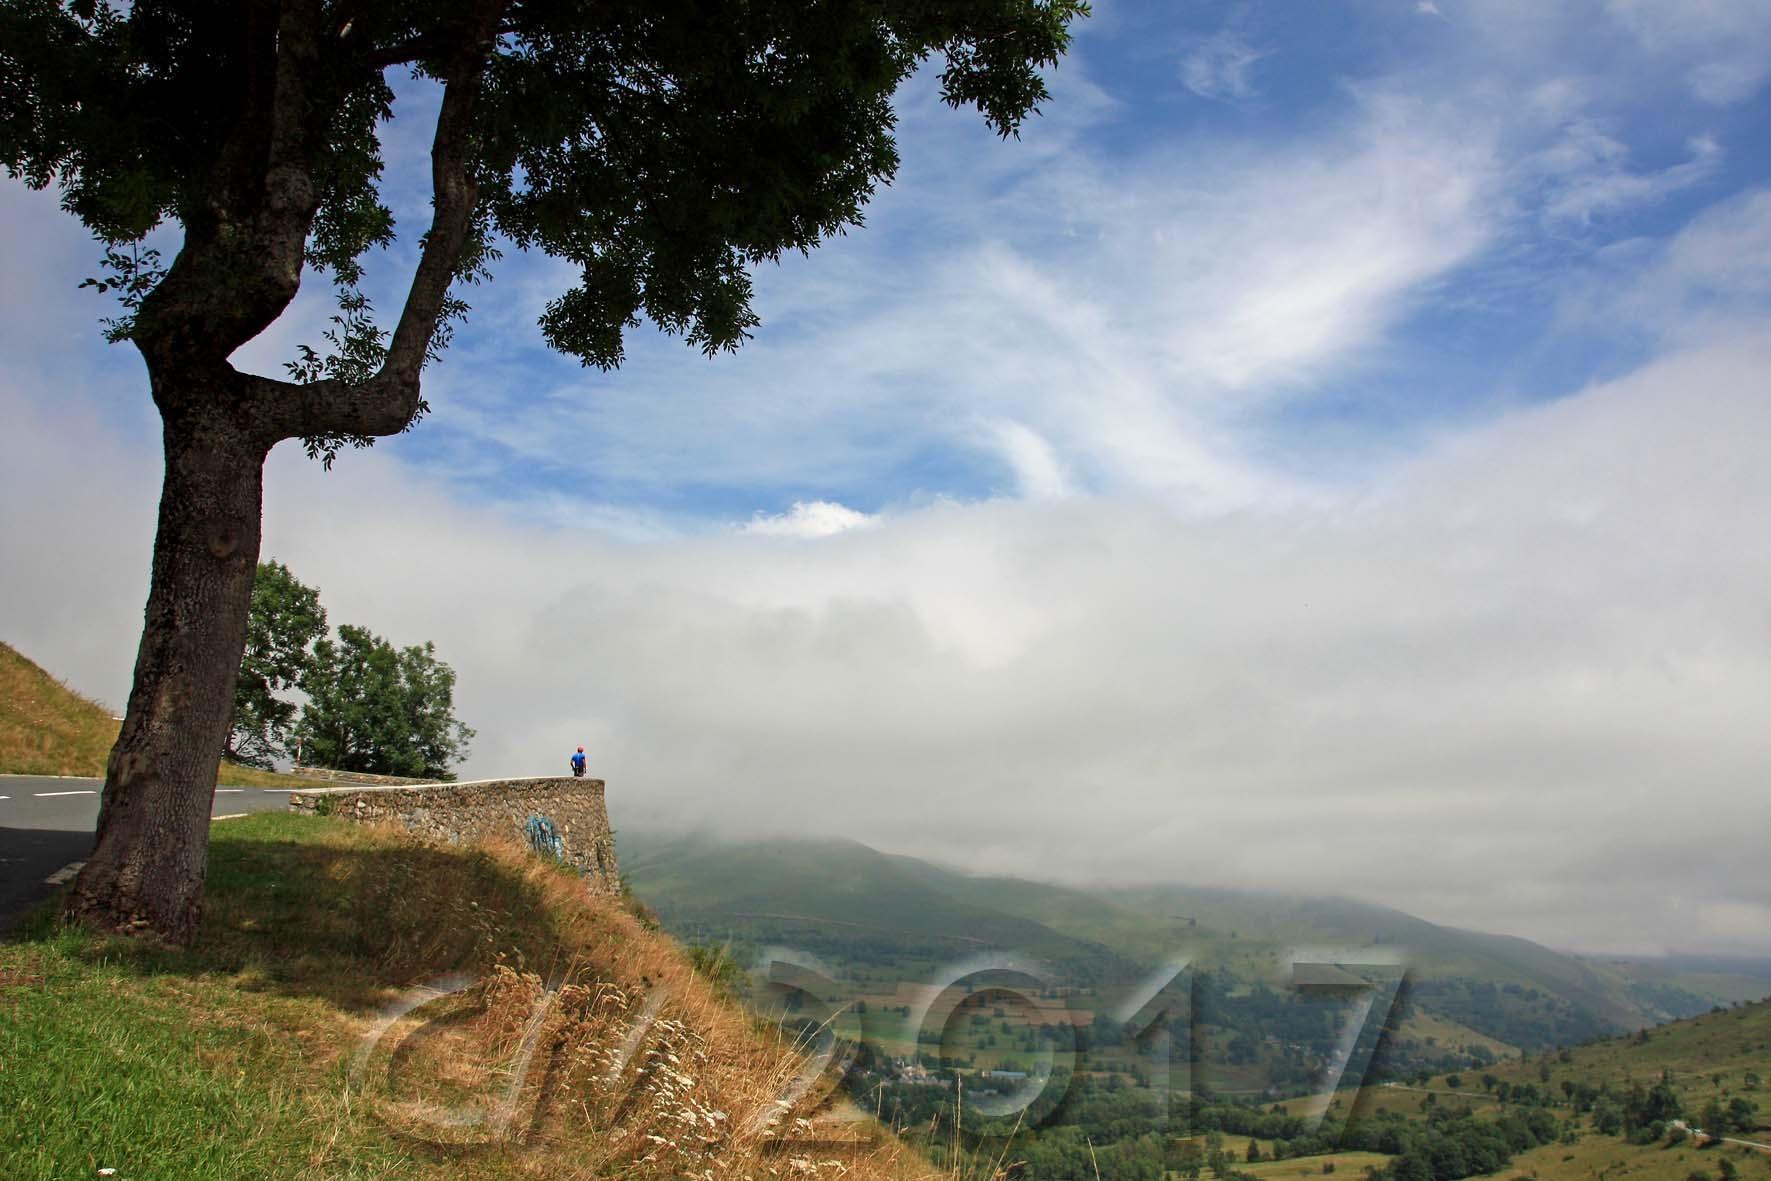 Col de Peyresourde, Autor: Charlotte Moser